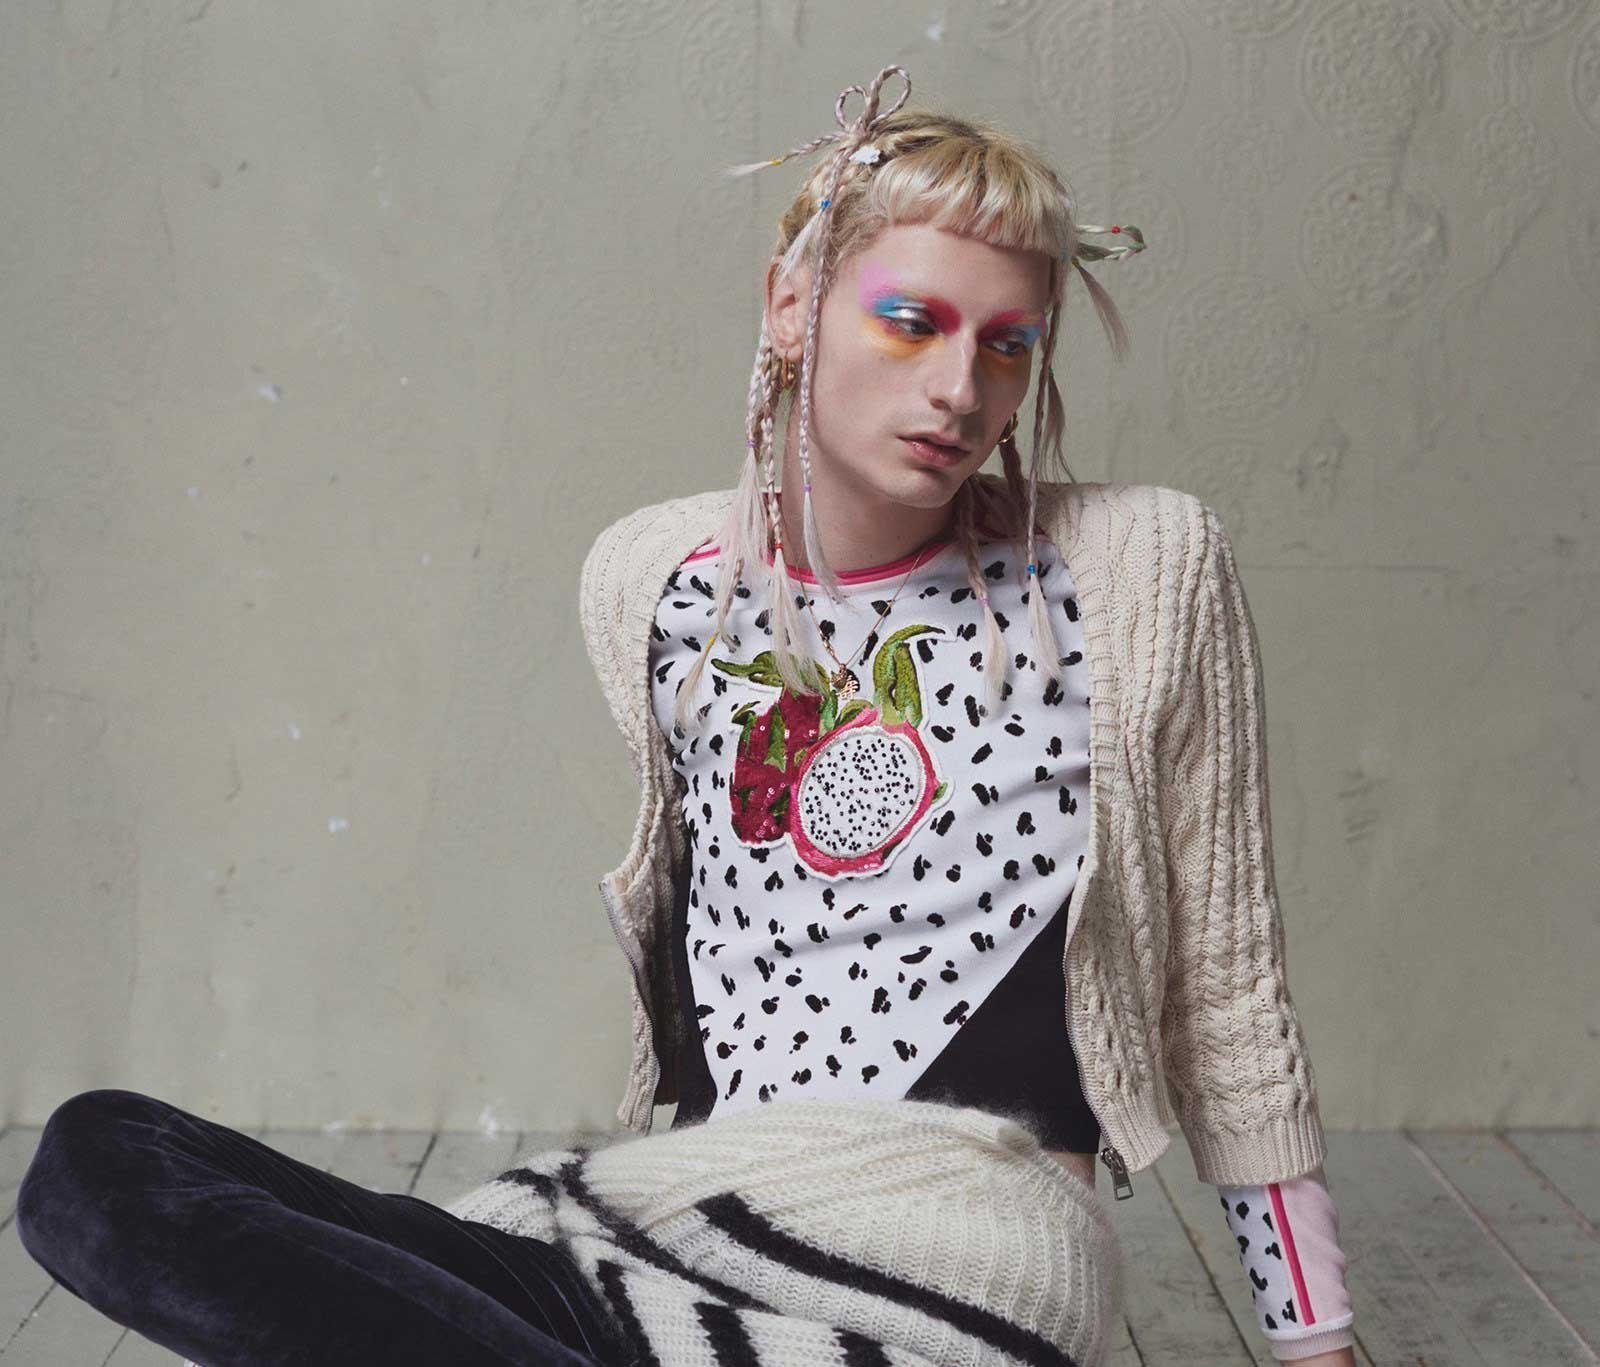 Photography Dazed/Sarah Plantadosi. Fashion Elizabeth Fraser Bell.